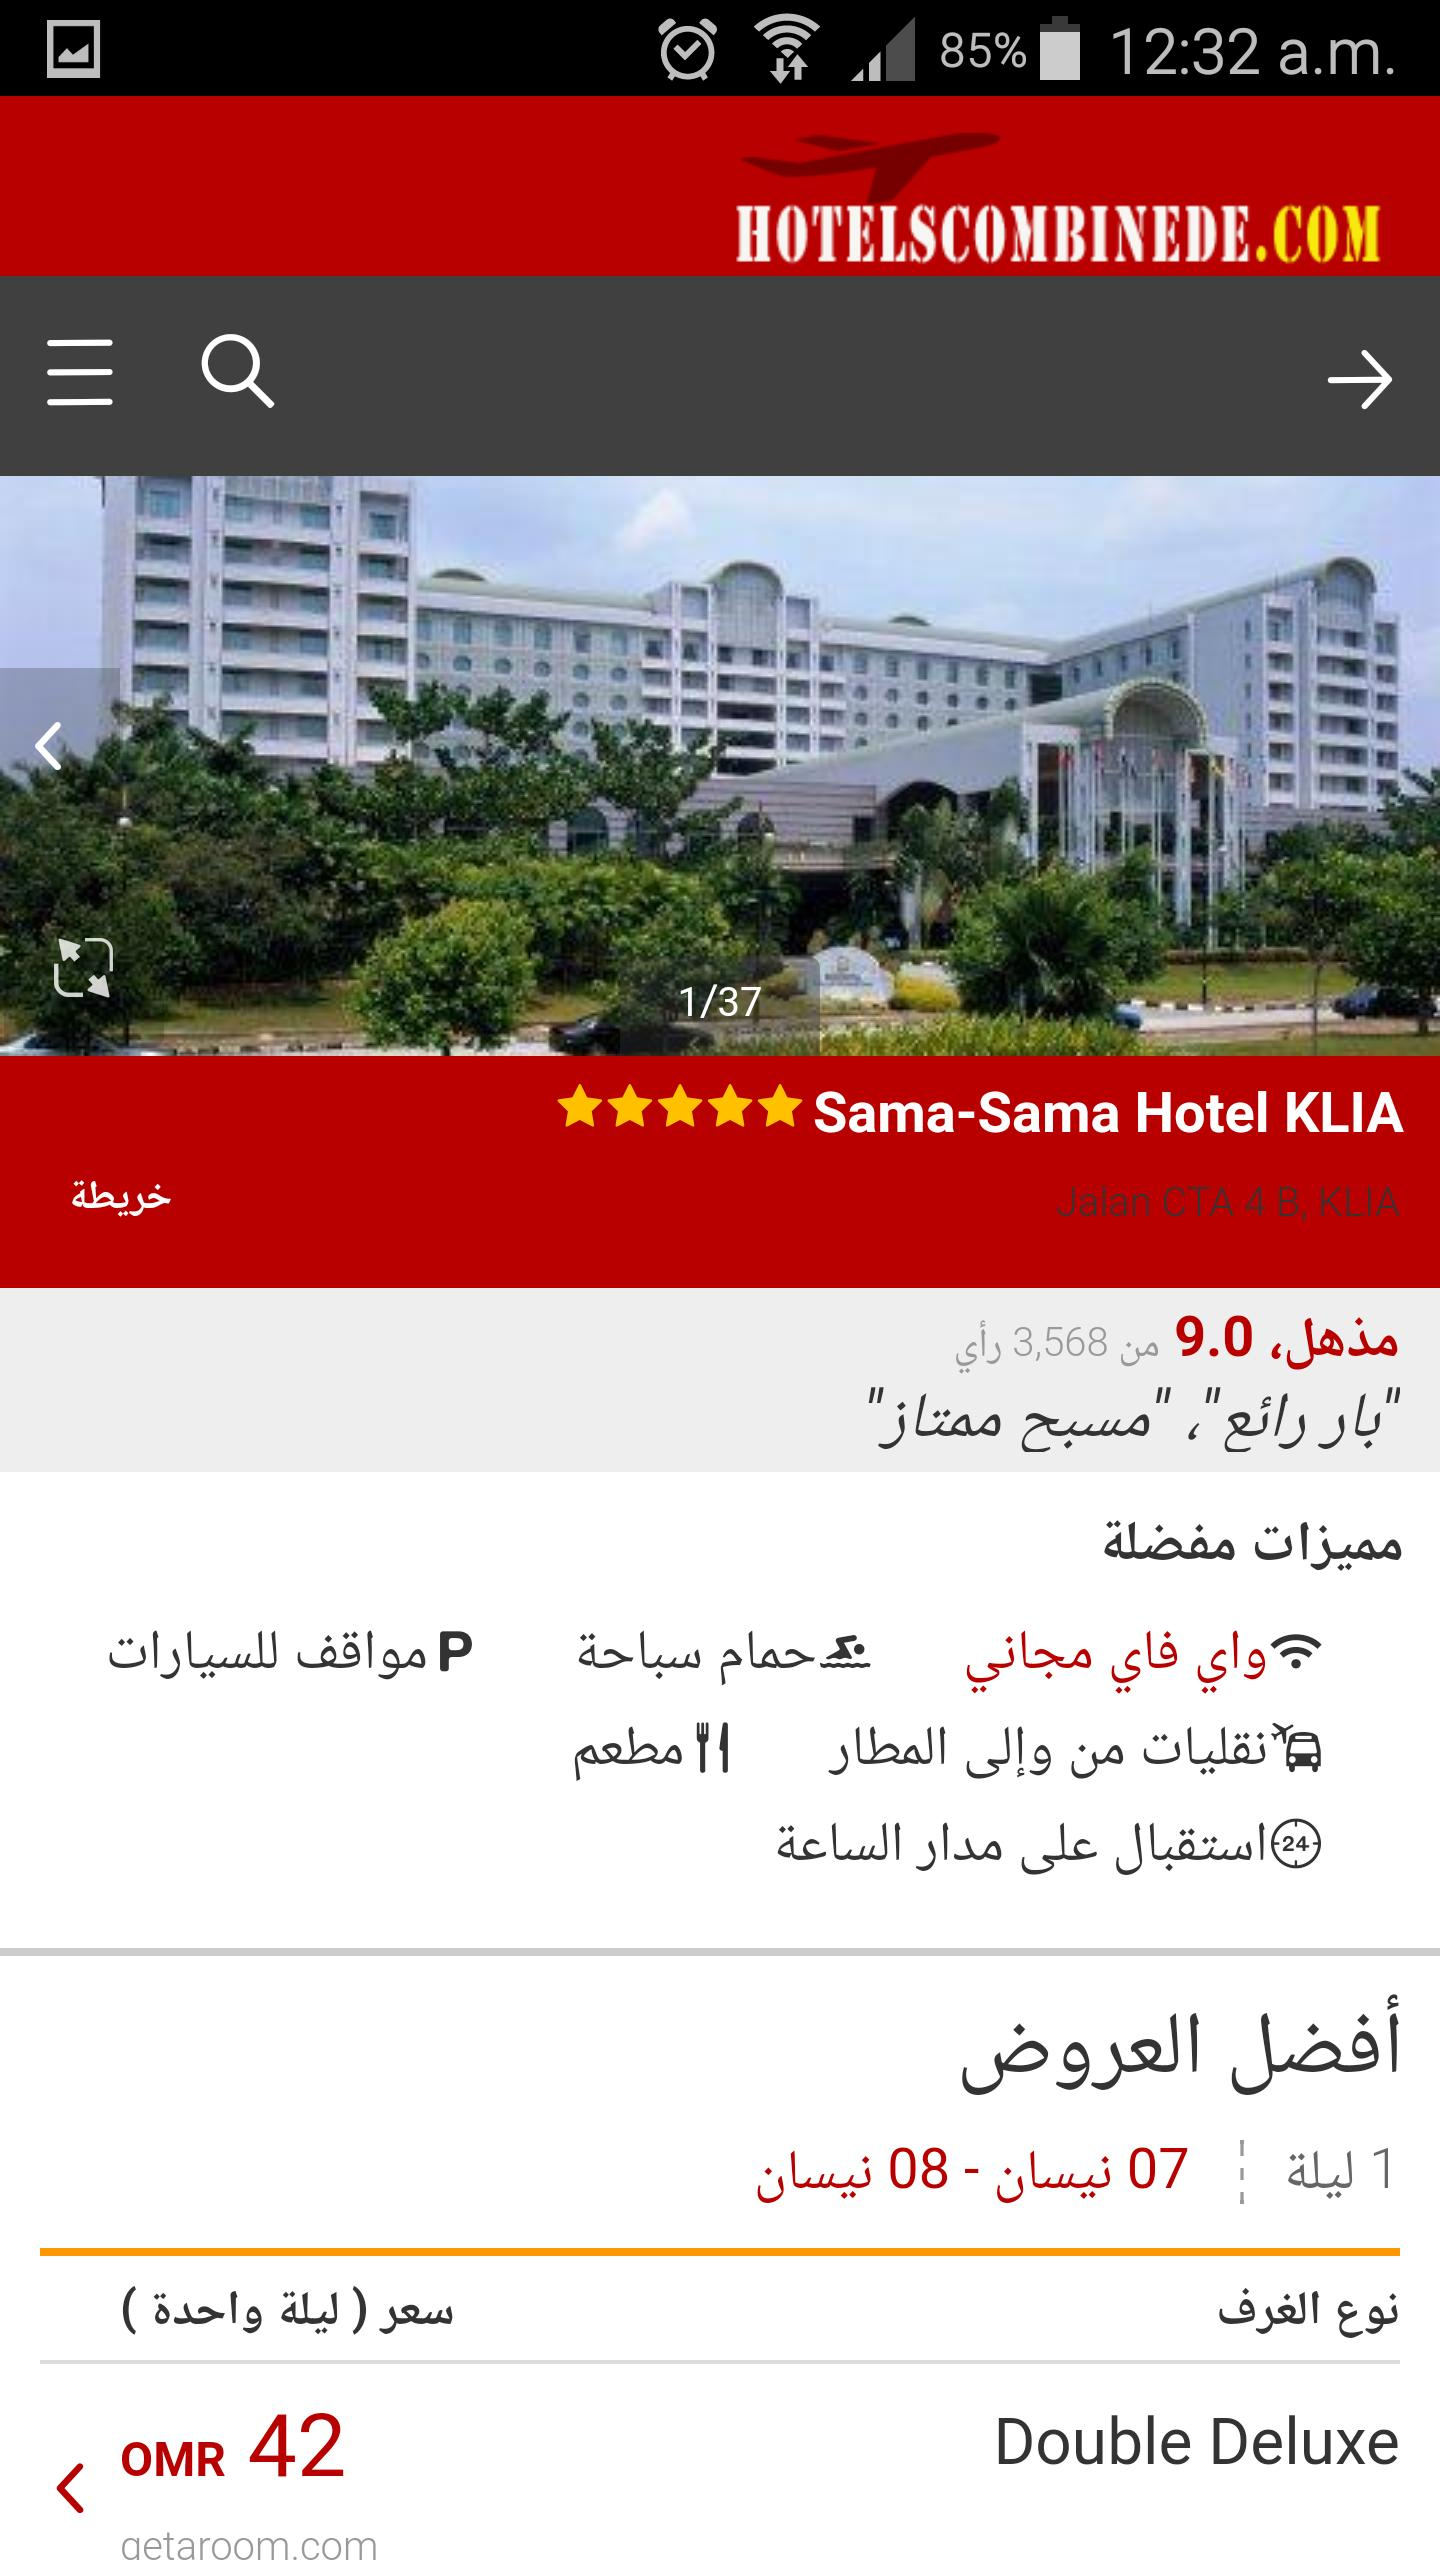 Hotel Reservations 5 تصوير الشاشة